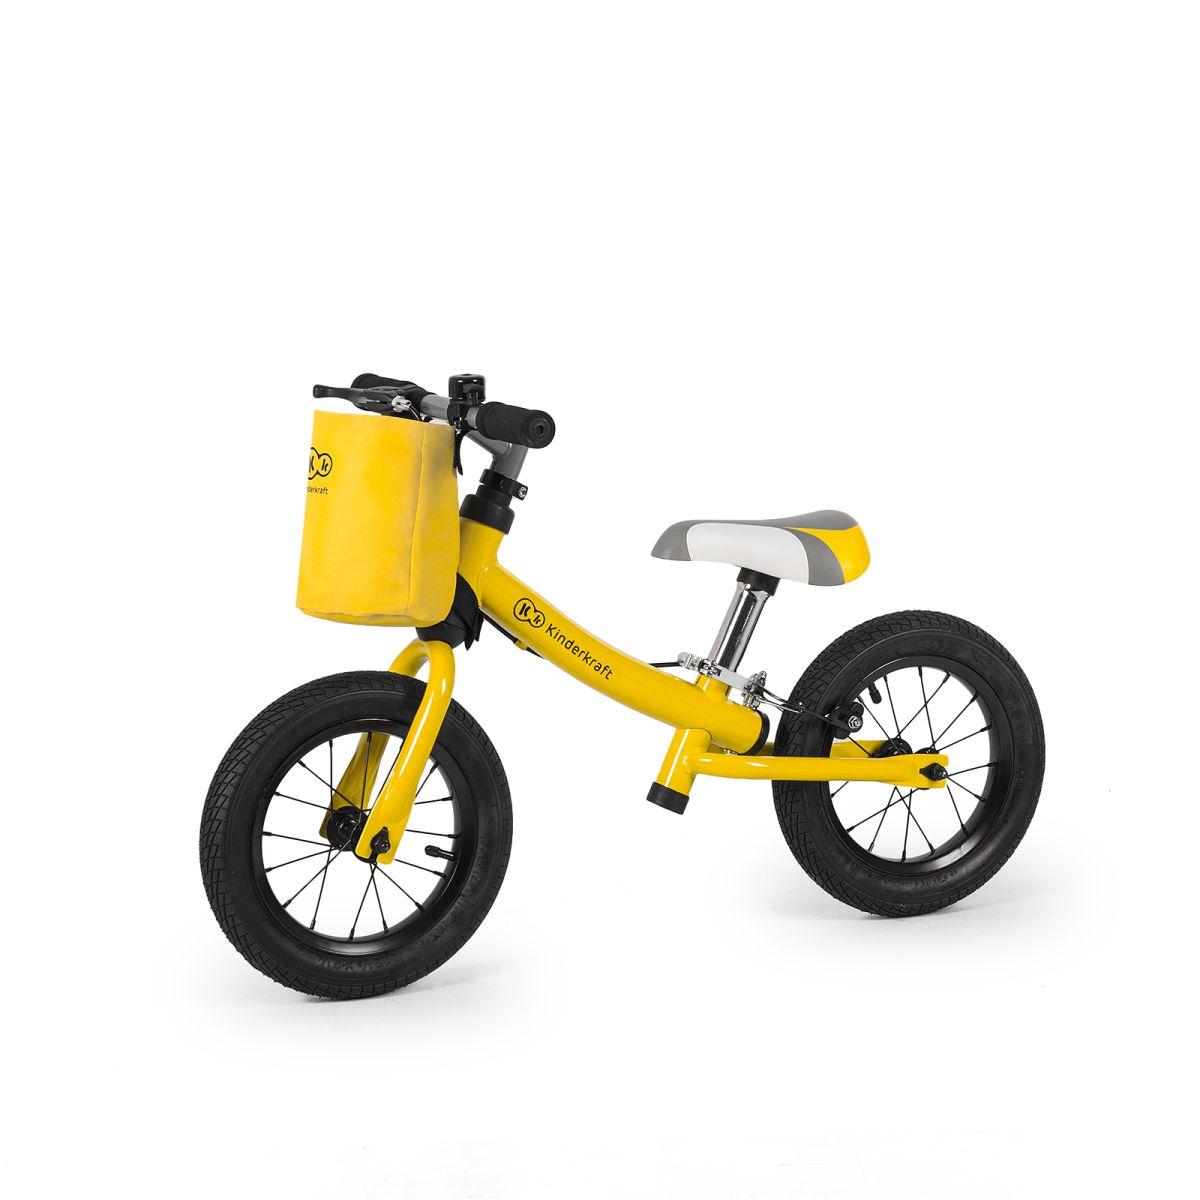 laufrad lernlaufrad kinderlaufrad roller kinder fahrrad. Black Bedroom Furniture Sets. Home Design Ideas